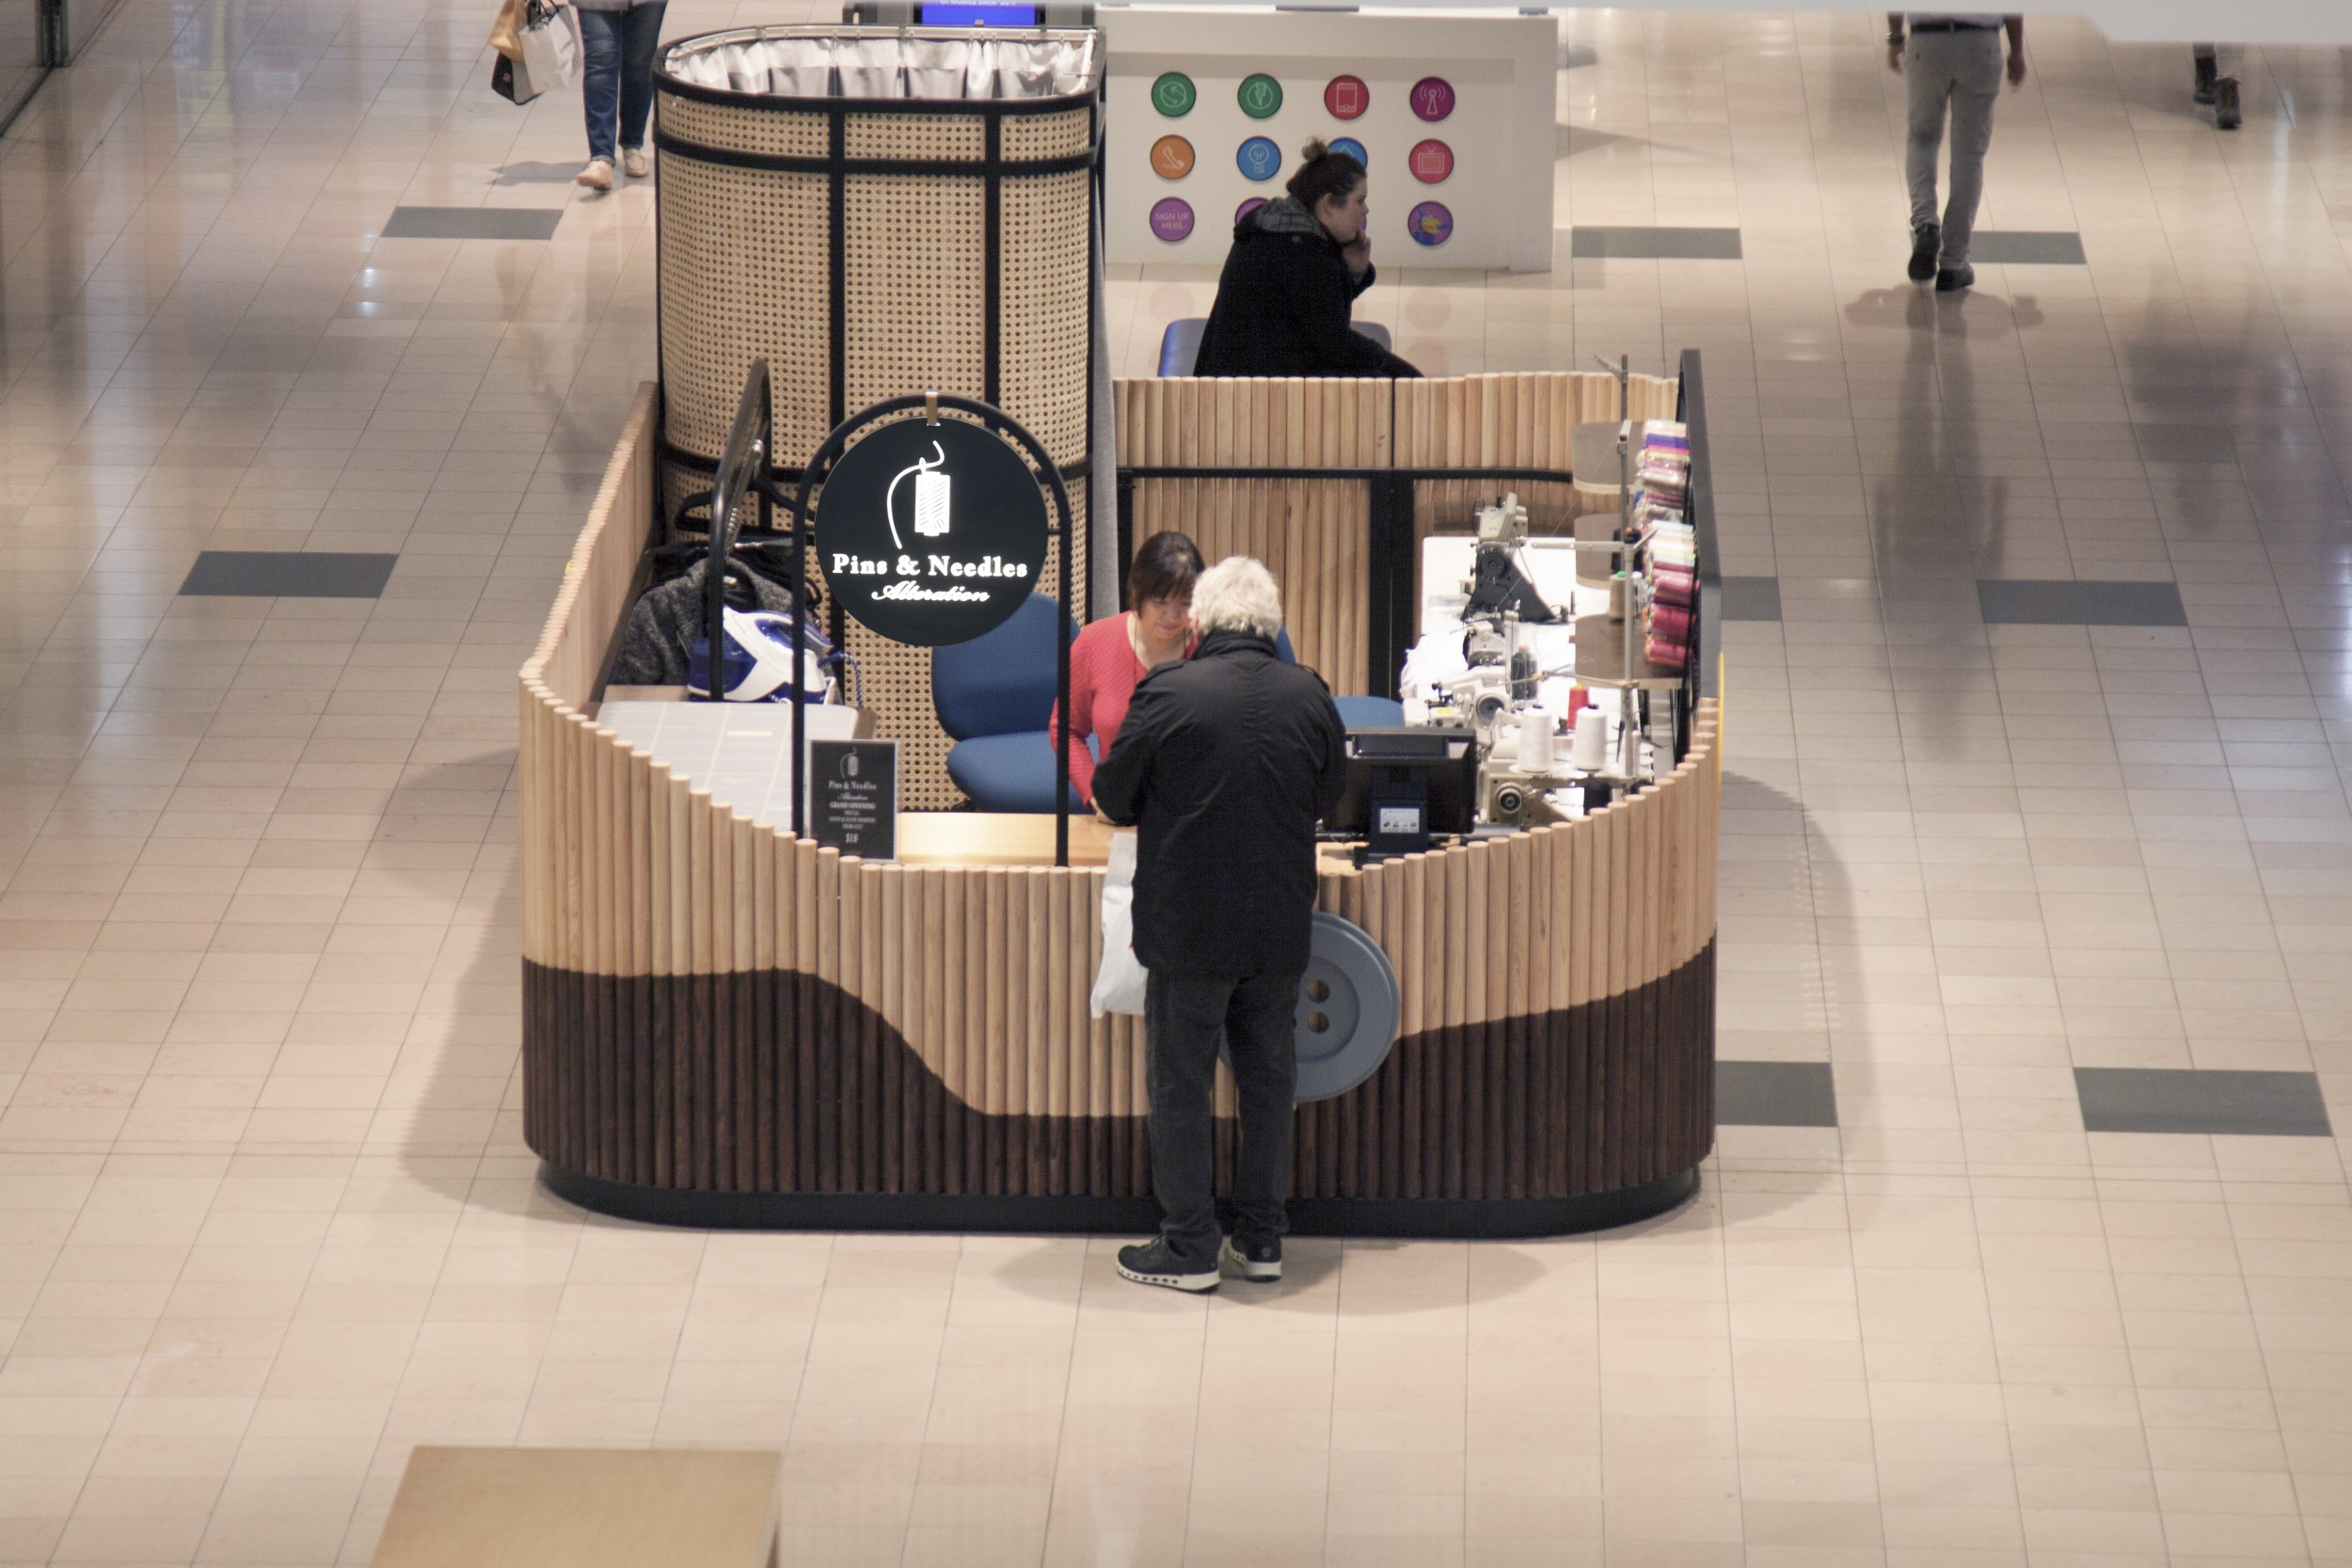 alteration kiosk design and build centre square